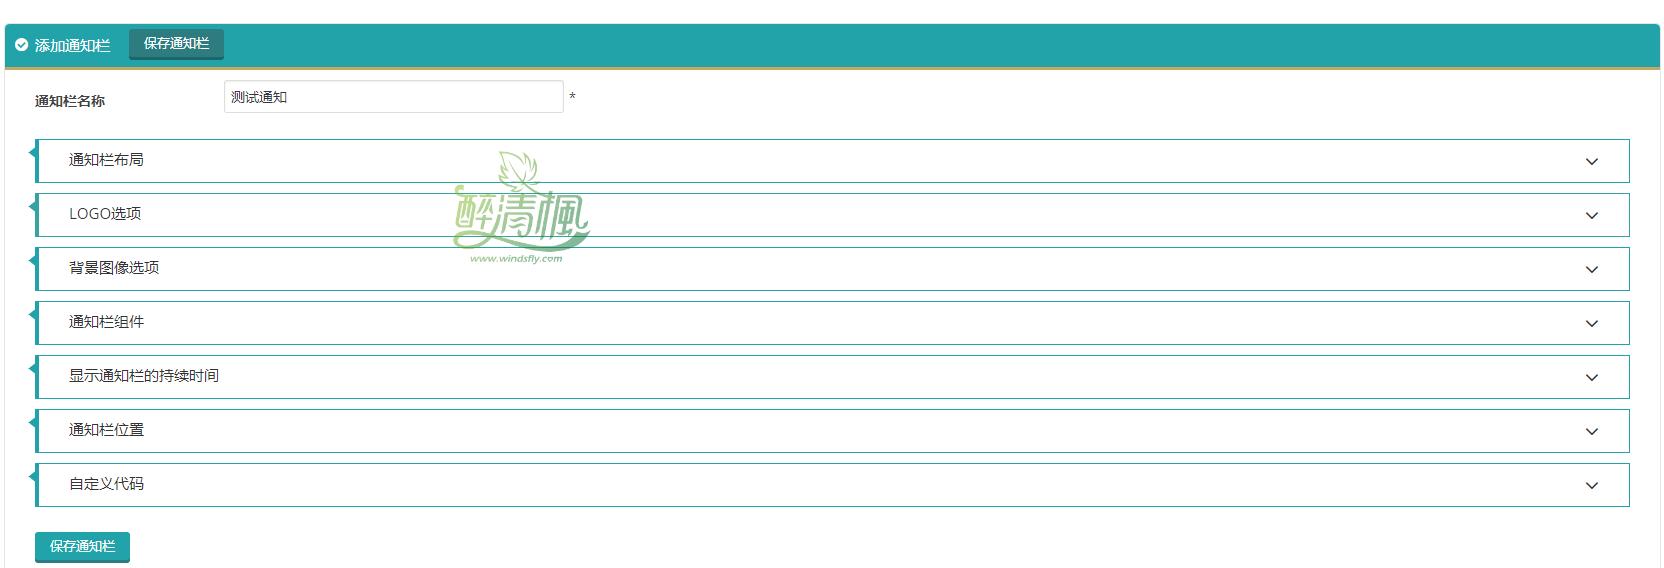 WordPress高级通知插件 - Apex Notification Bar(汉化)[更新至v2.1.1] WordPress插件 第2张